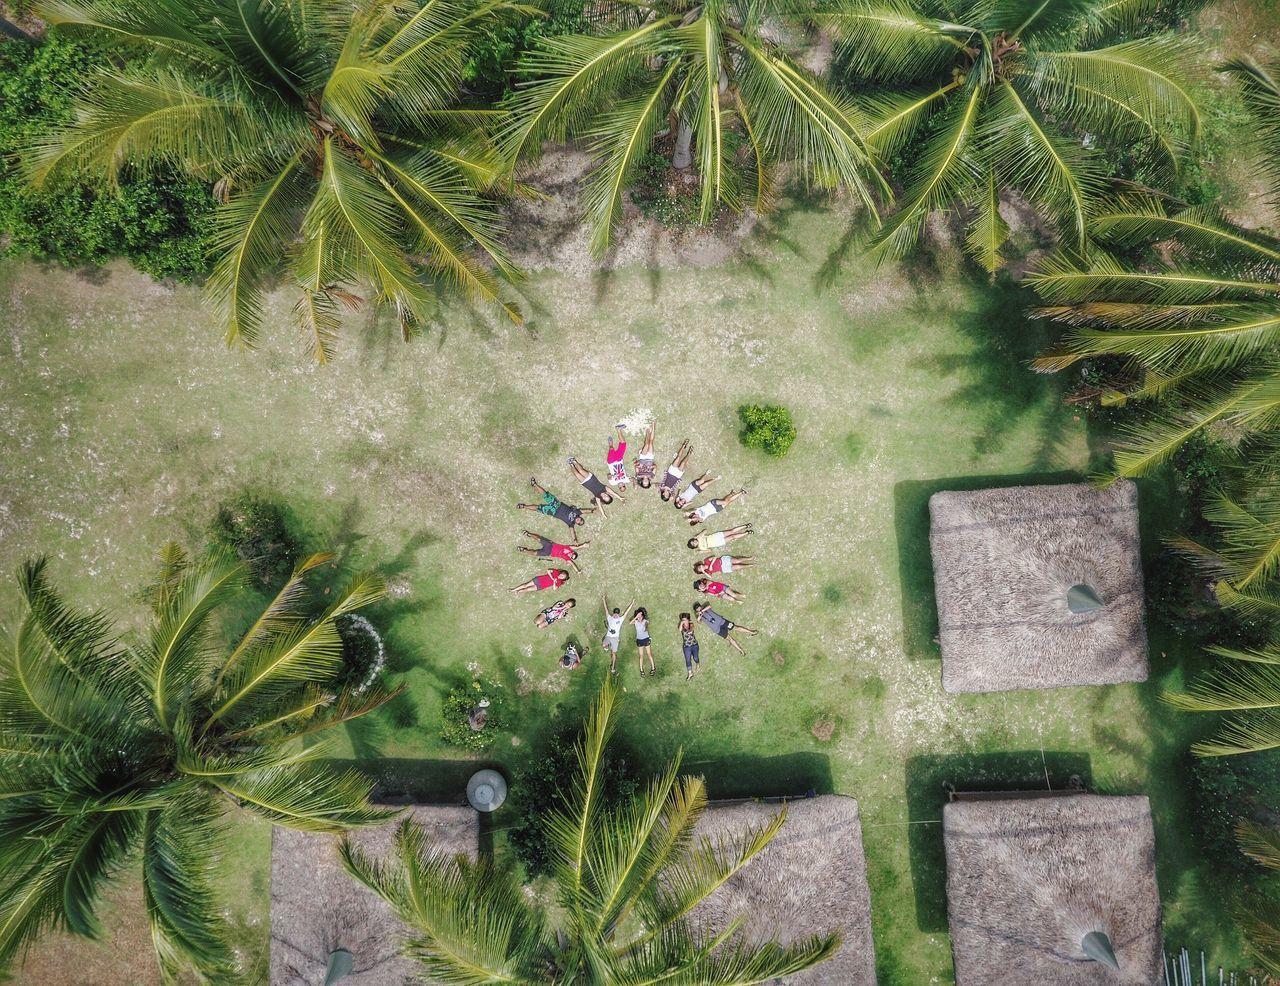 PLANTS ON LANDSCAPE